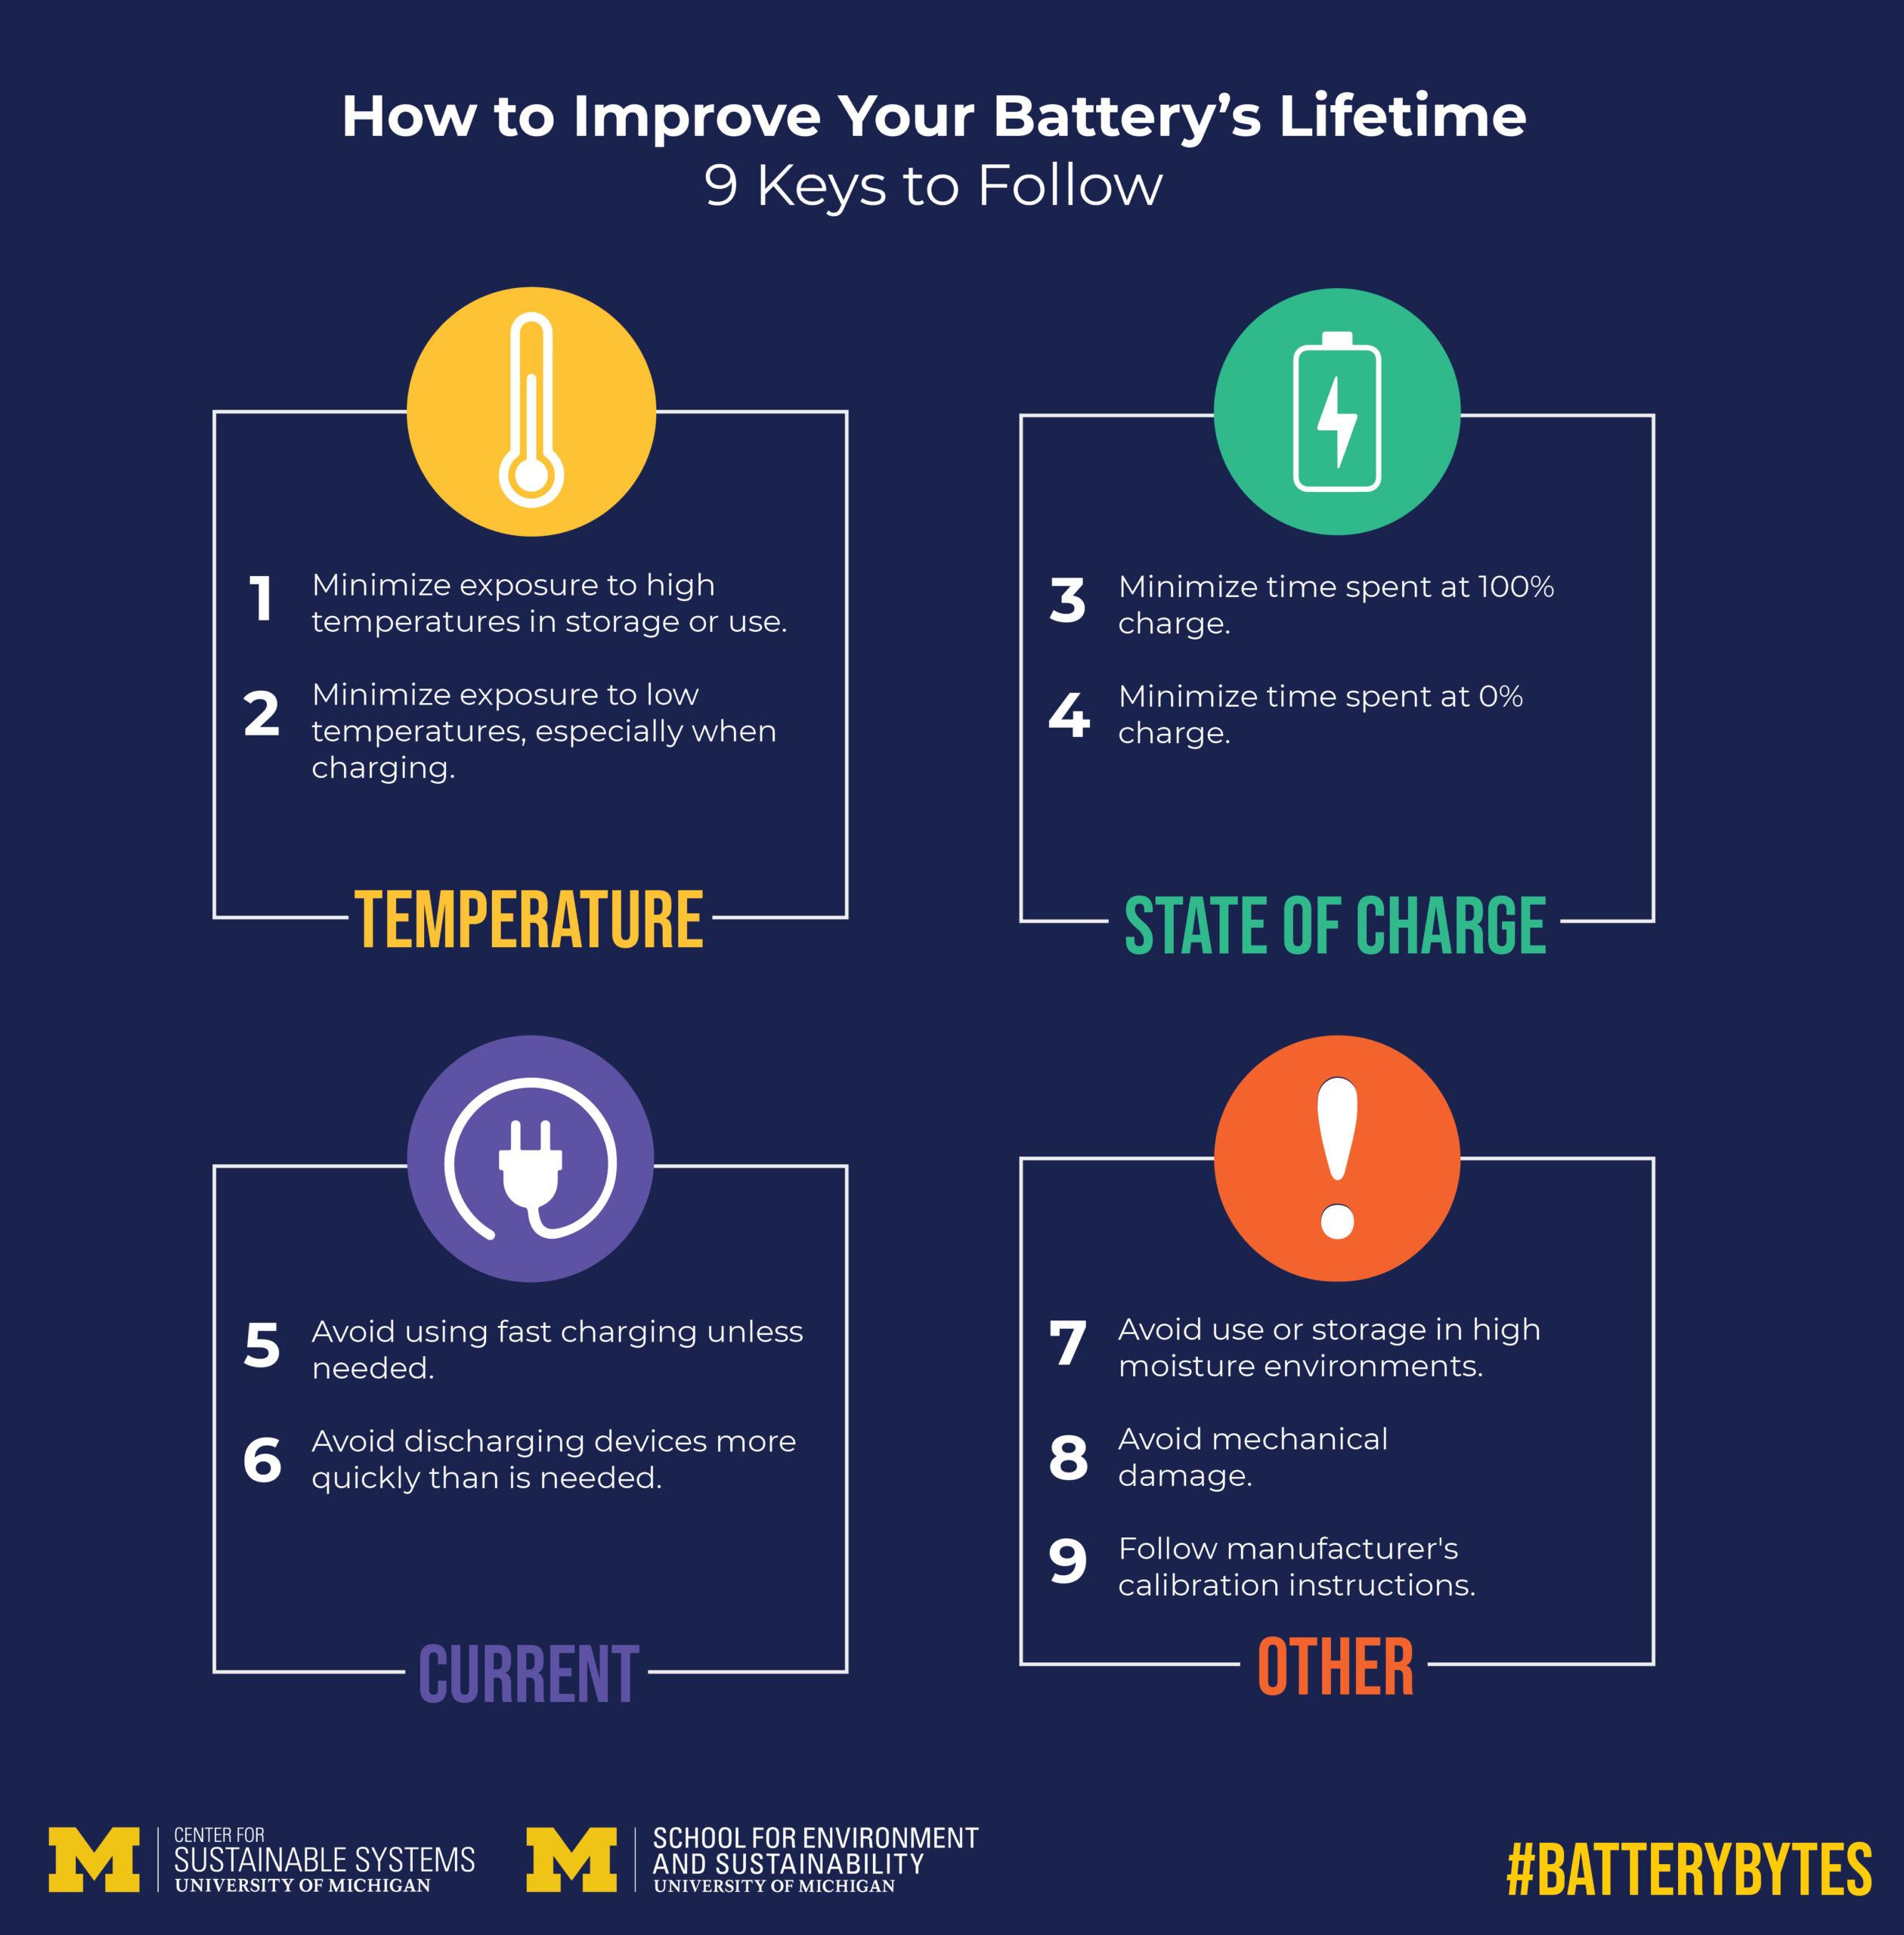 University of Michigan, lithium-ion battery life